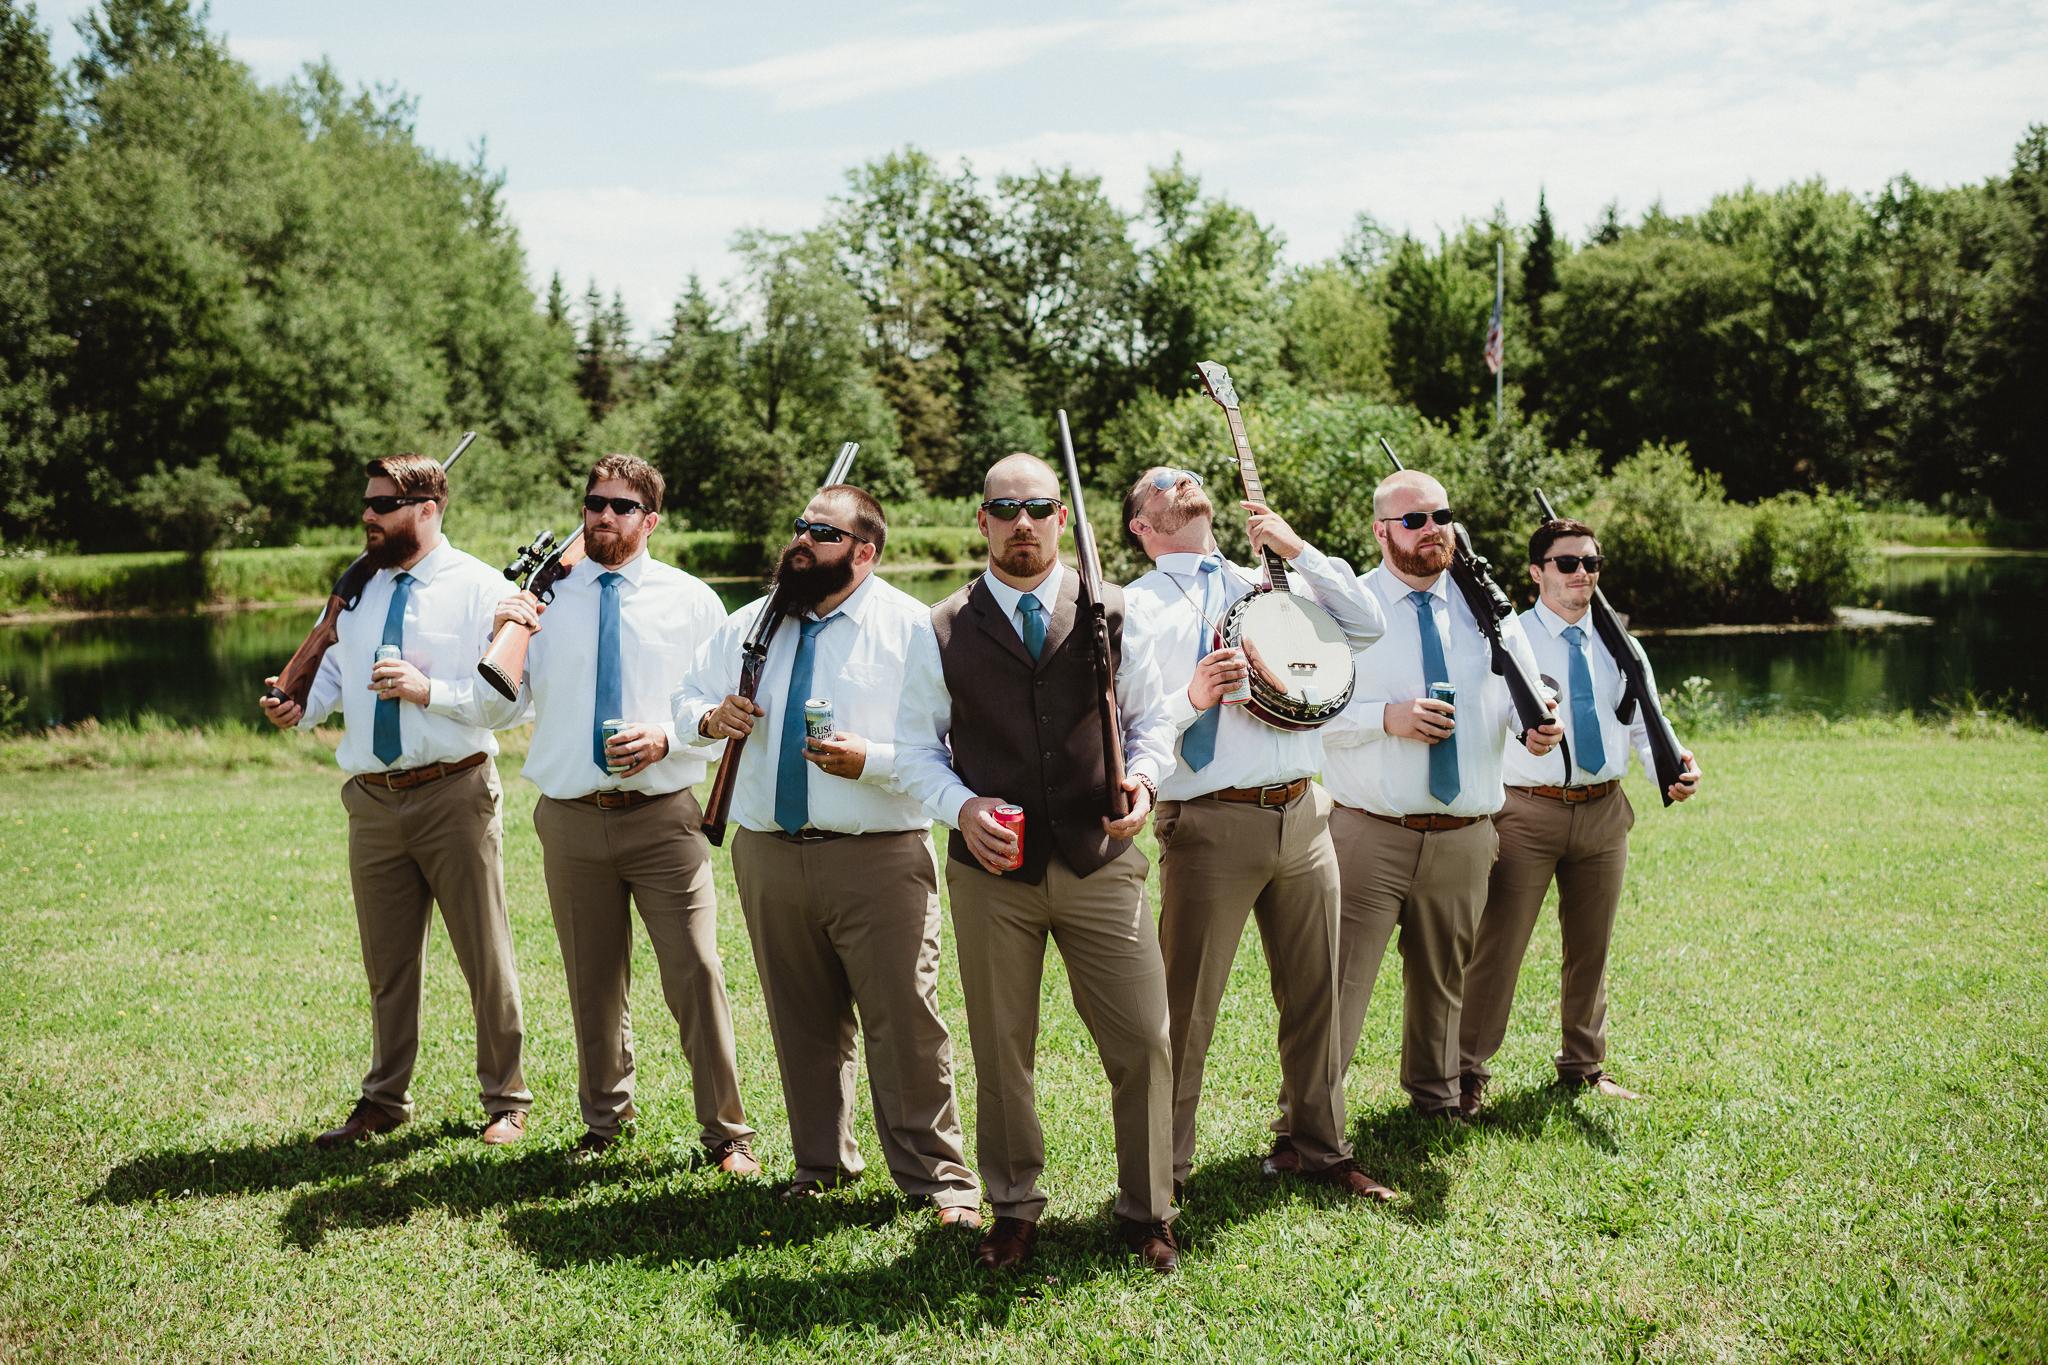 Wedding Photographers Rochester, NY